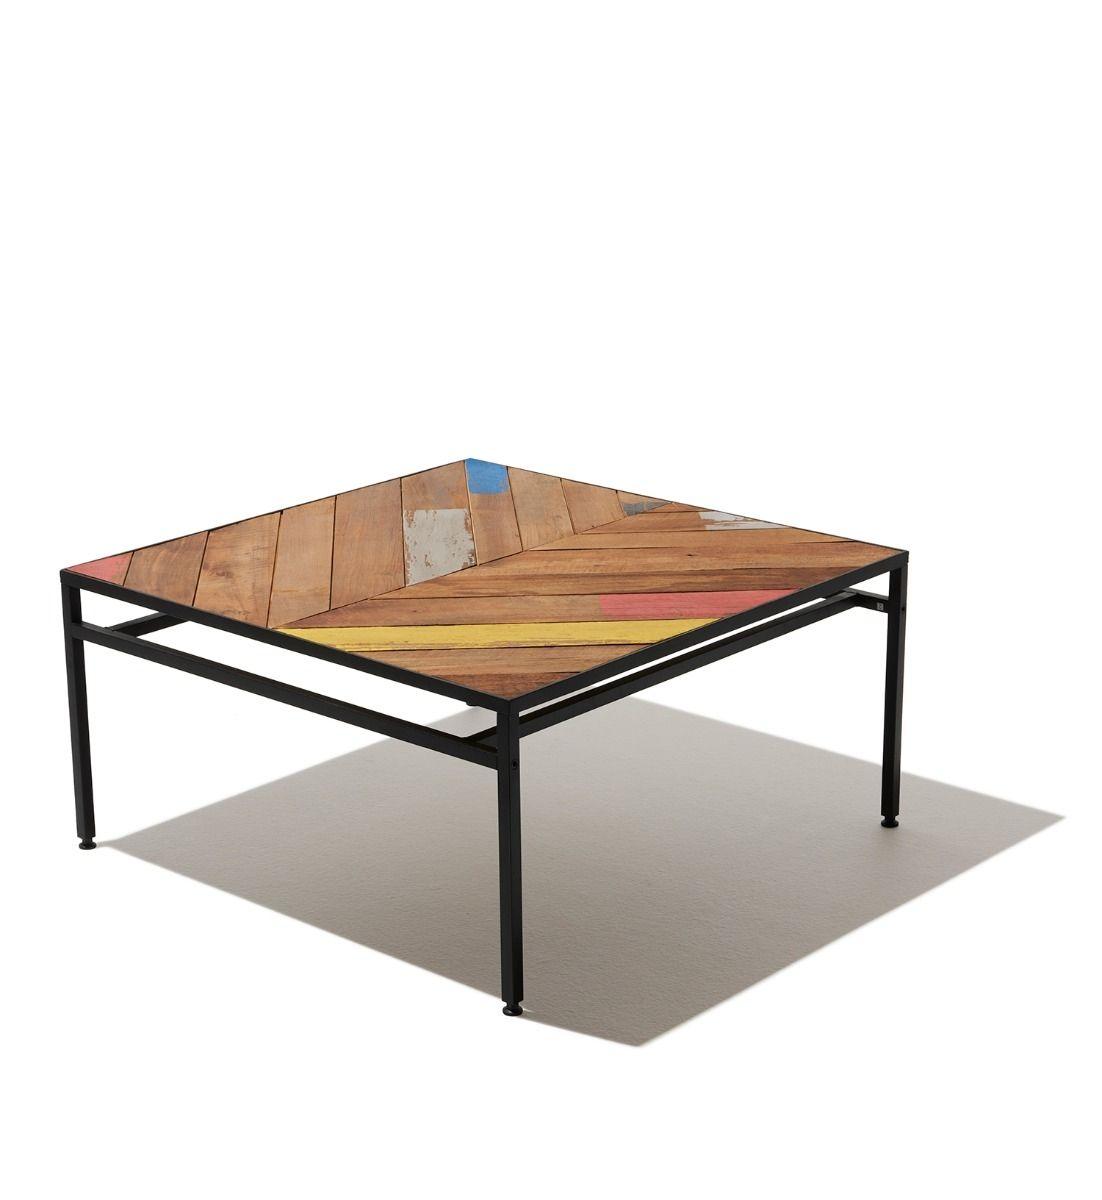 Bauhaus Coffee Table Large 茶几 Table Wood Table Home Decor